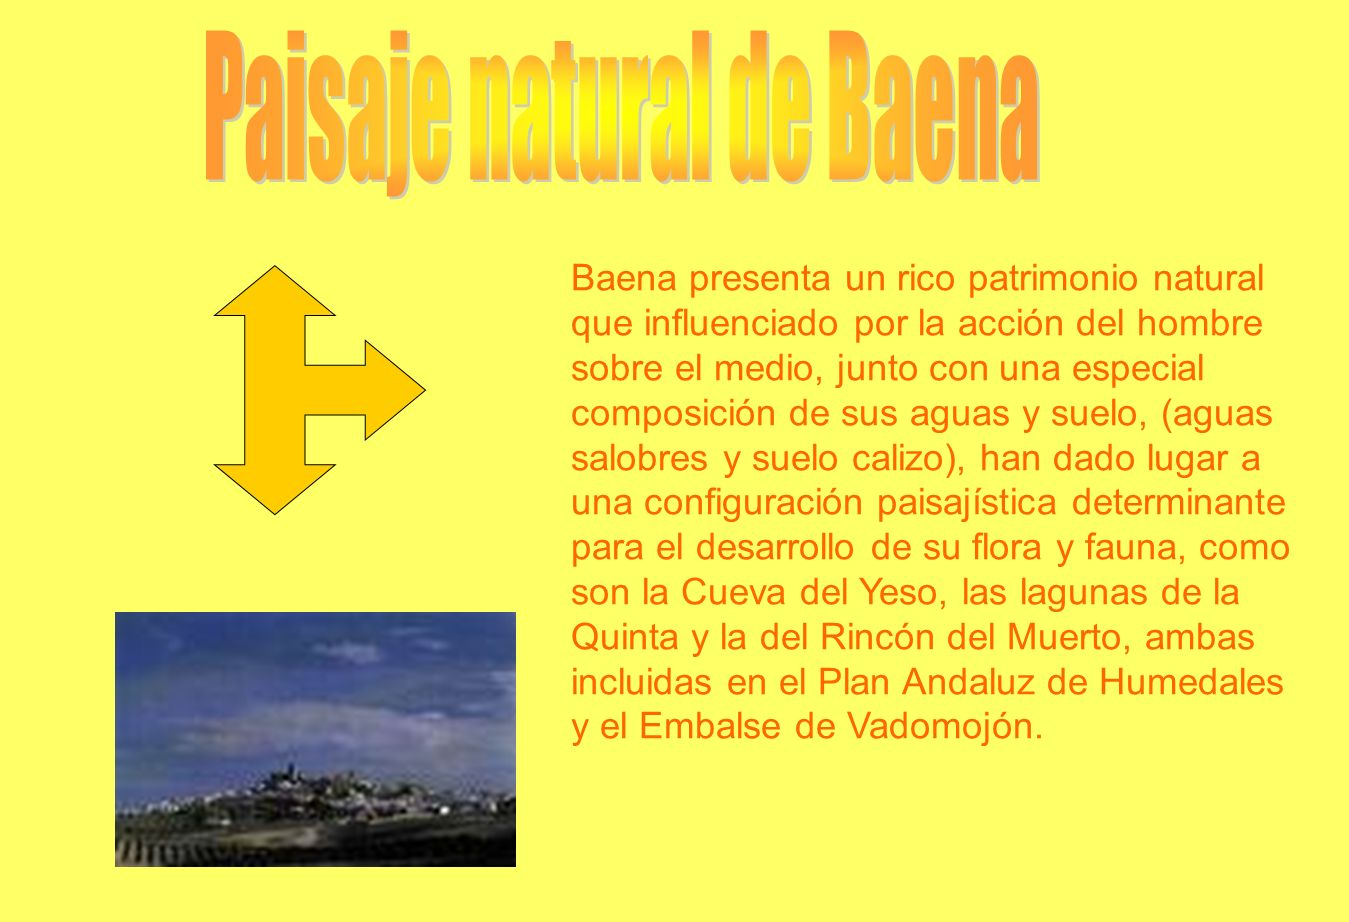 Paisaje natural de Baena